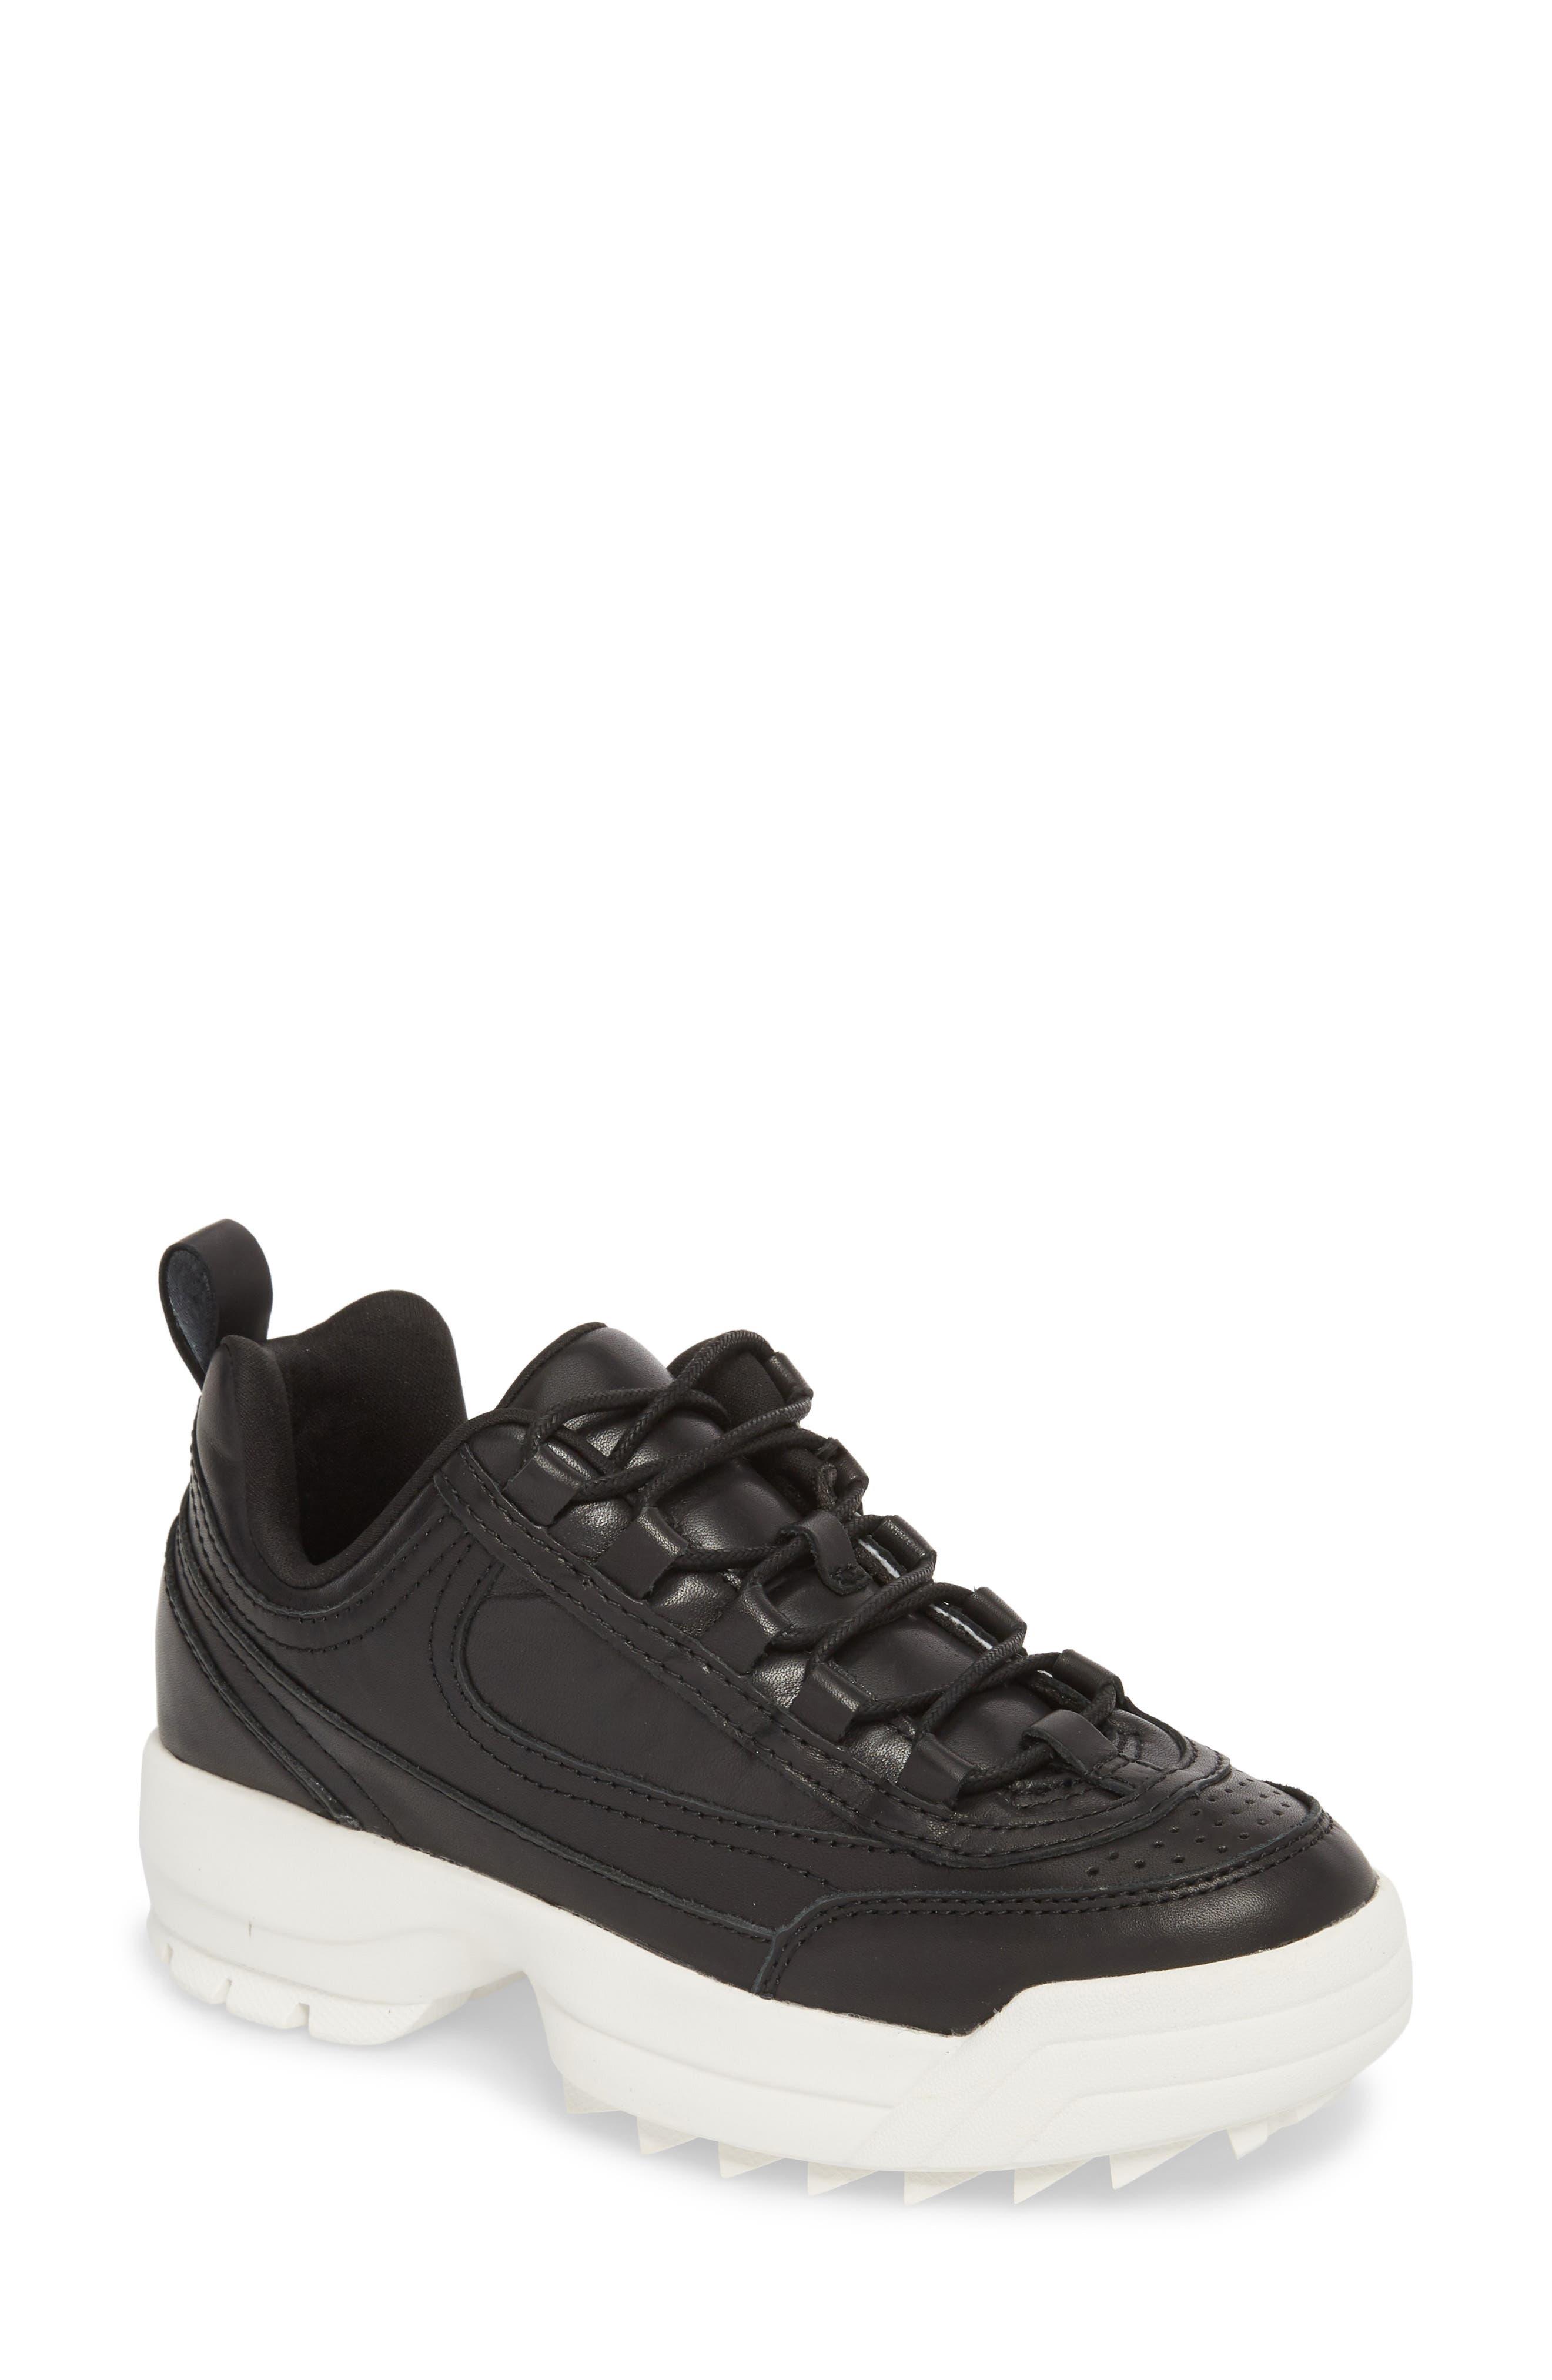 Sidekick Platform Sneaker,                             Main thumbnail 1, color,                             Black Leather